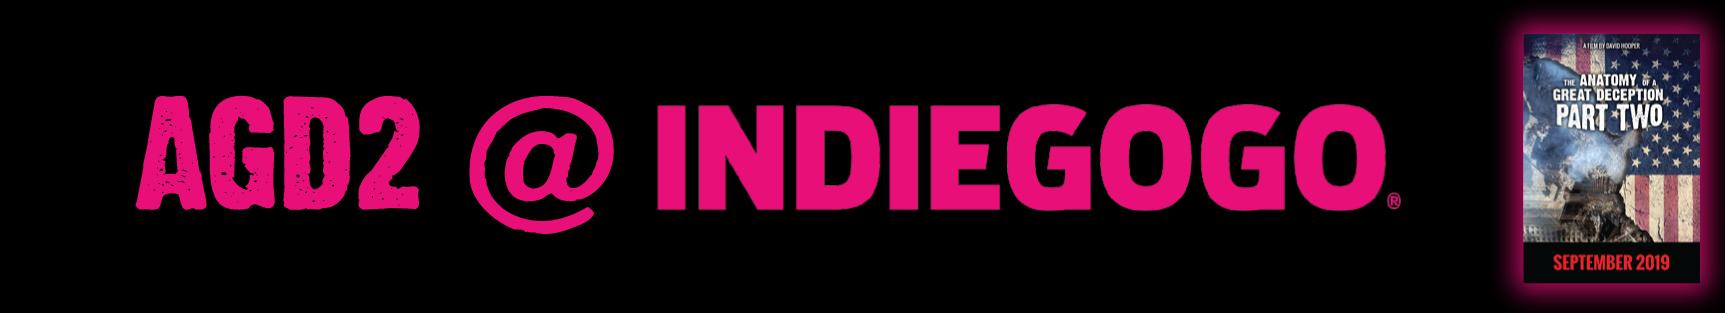 IndieGoGo Link AGD2